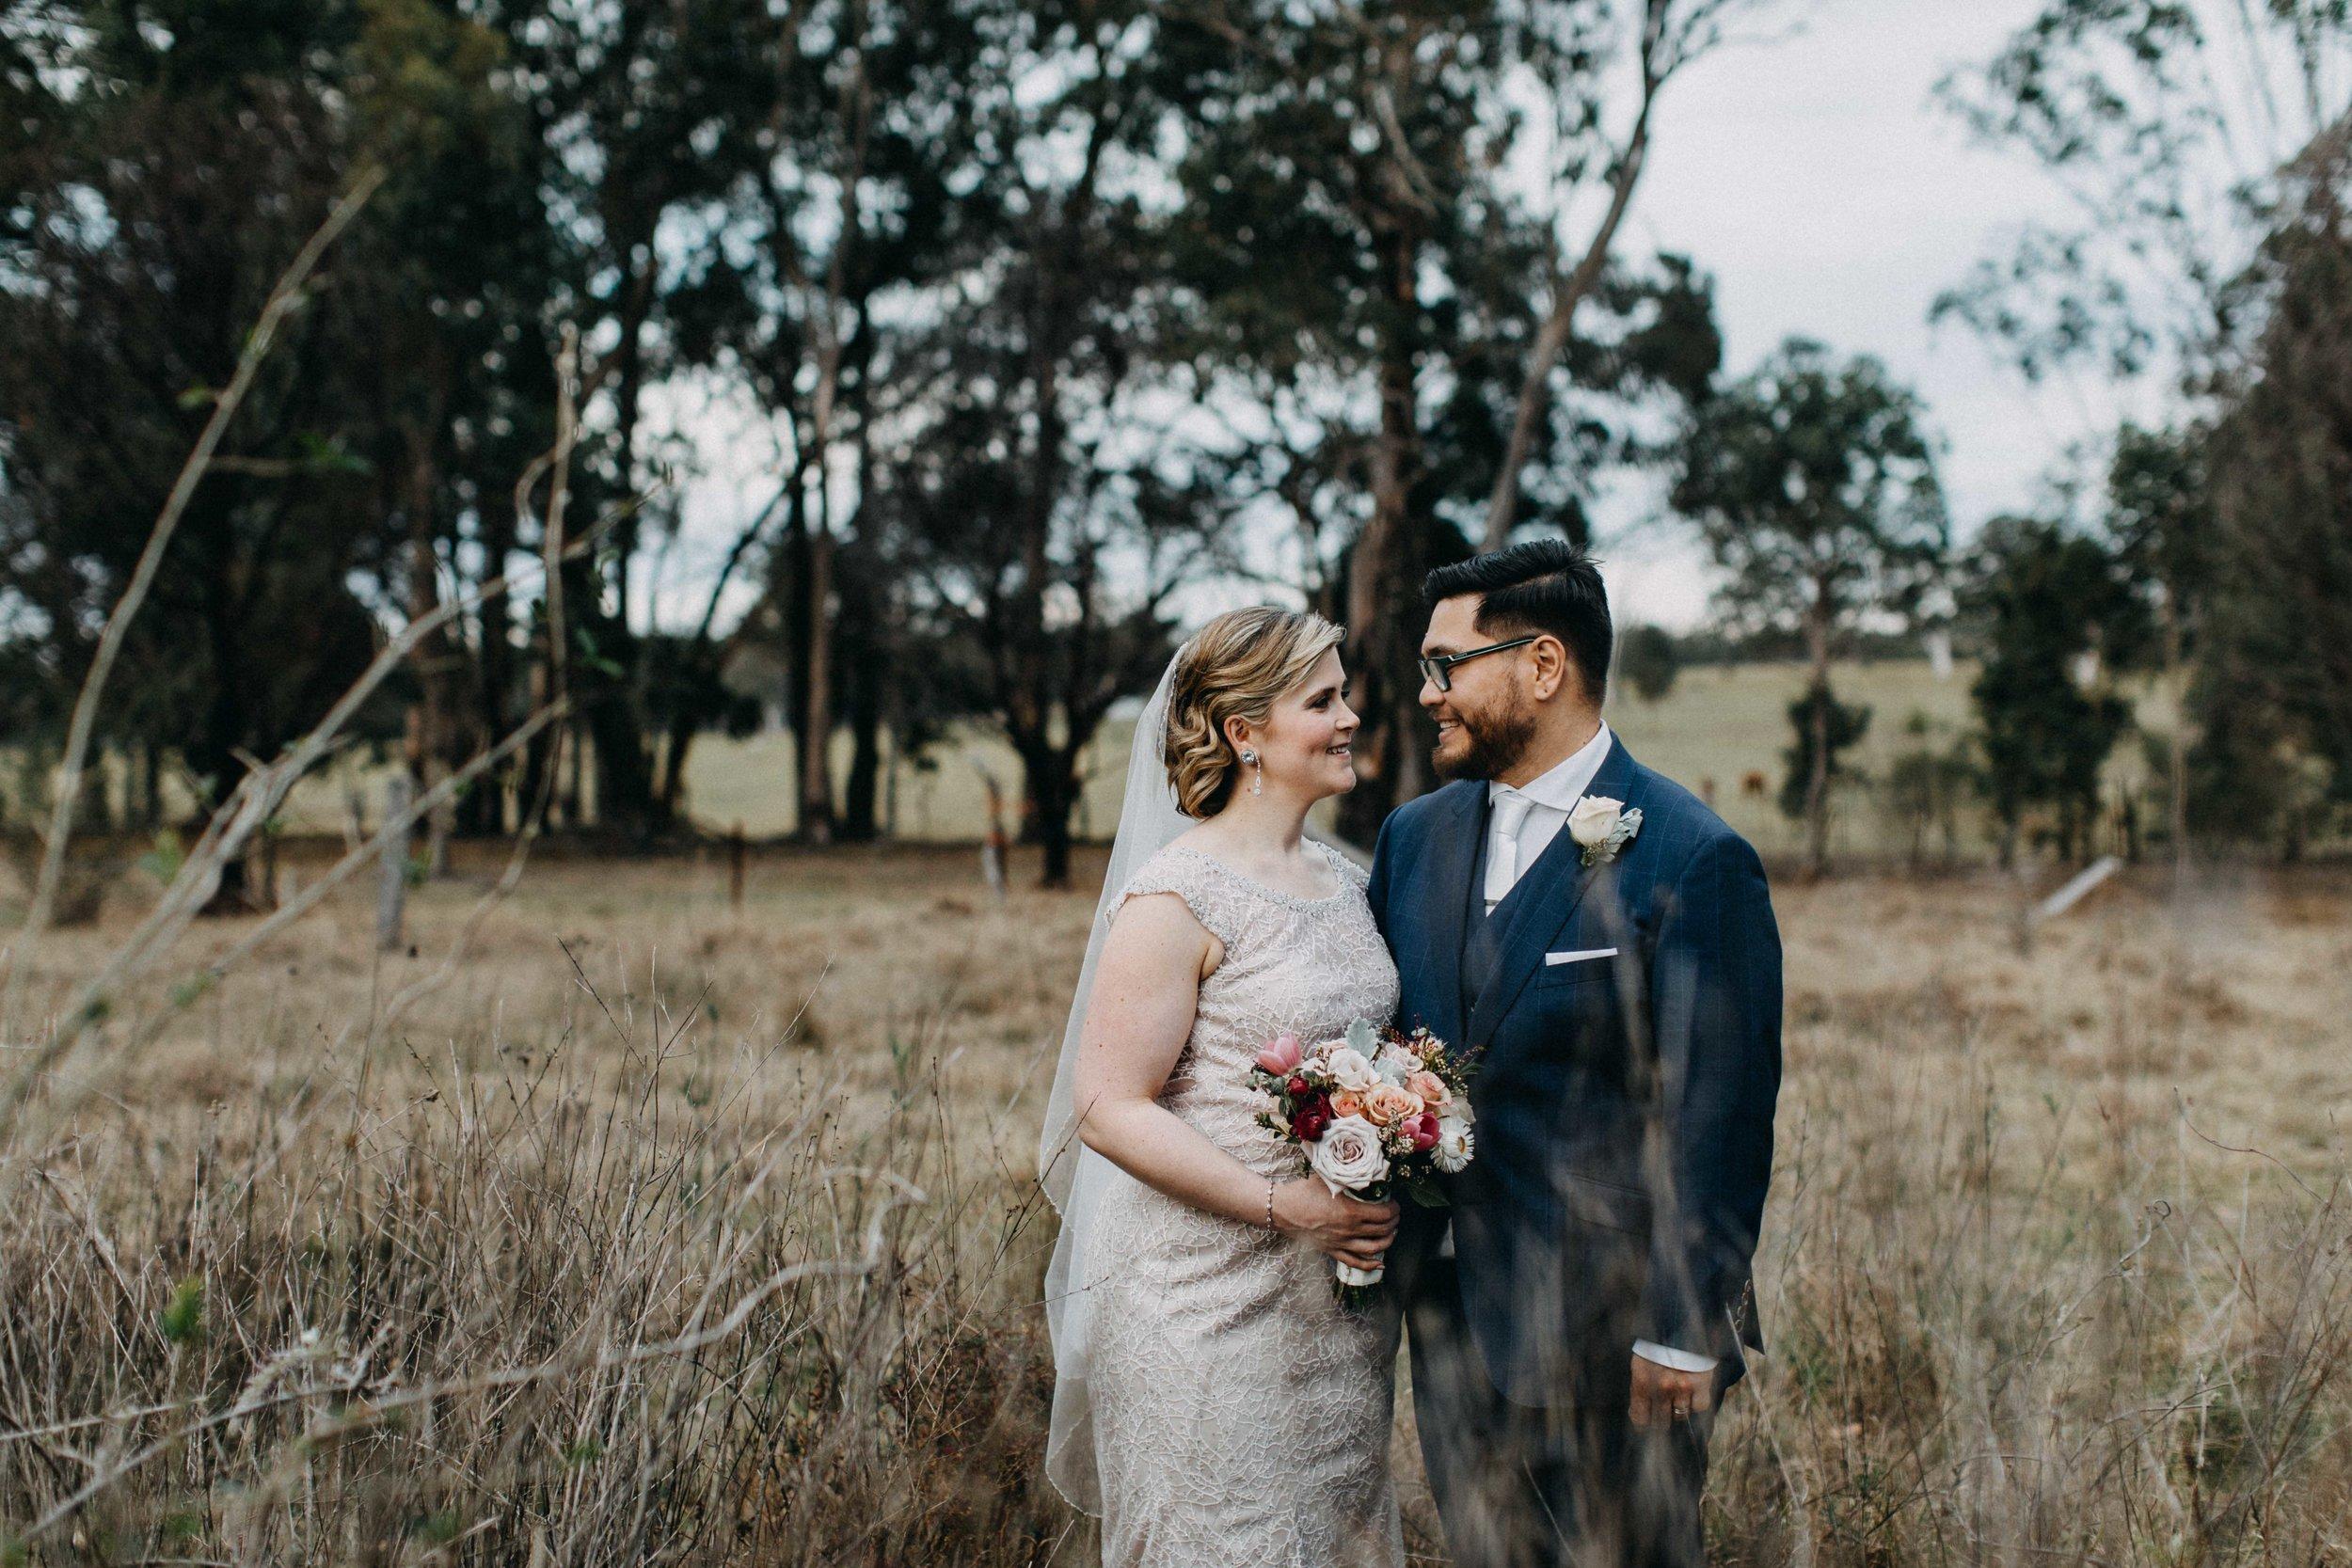 appin-house-wedding-macarthur-www.emilyobrienphotography.net-120.jpg